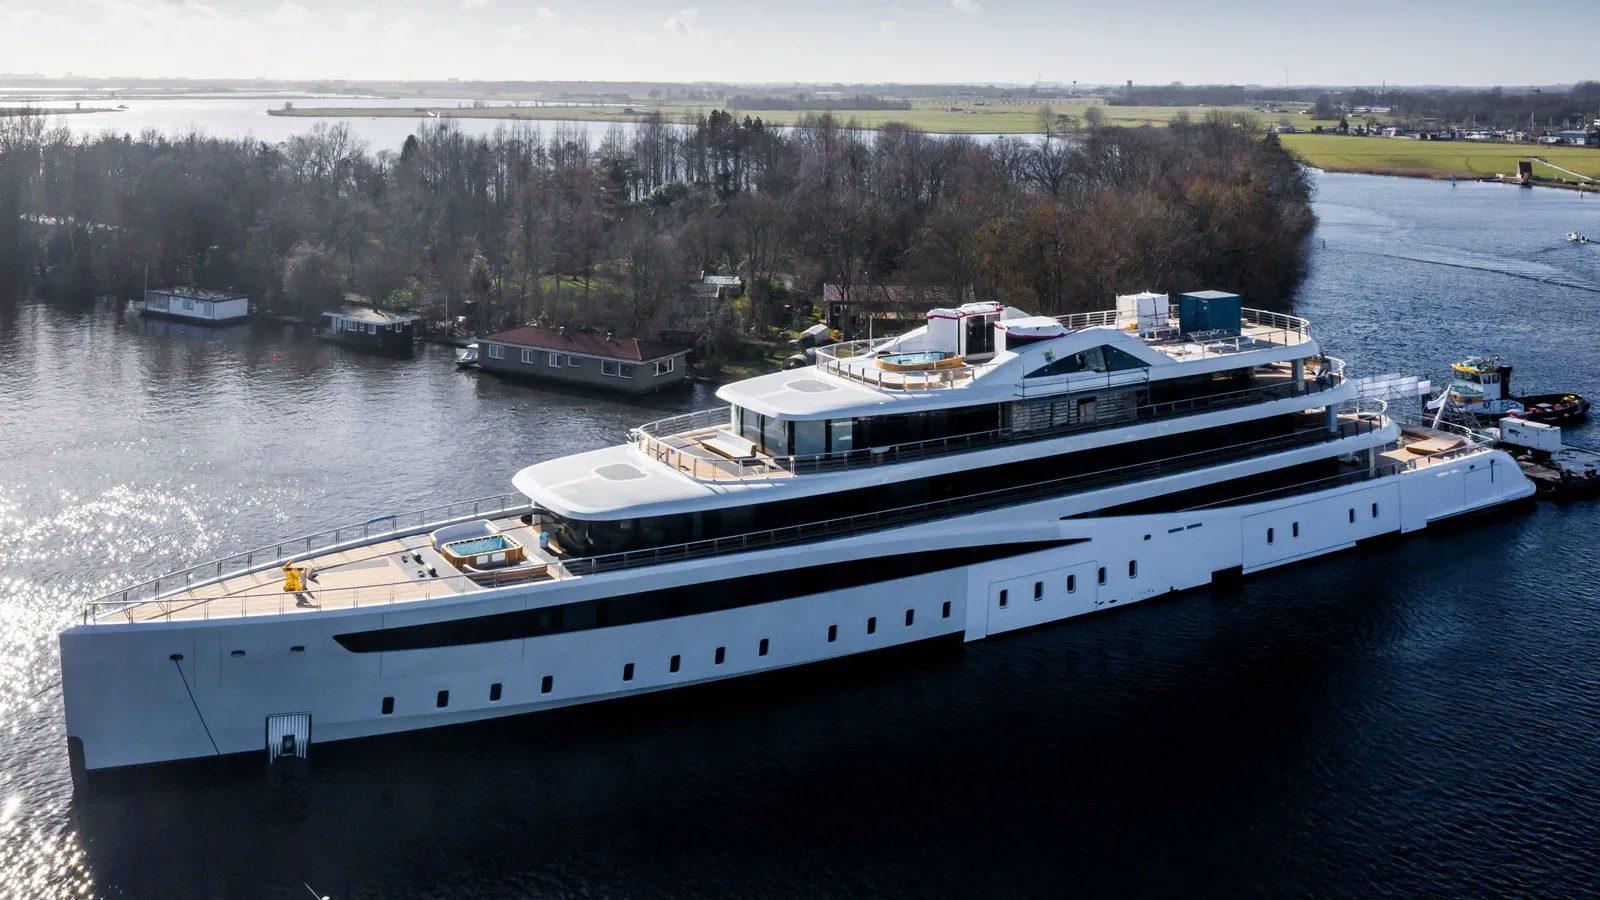 Superiate Viva Feadship - boat shopping 1